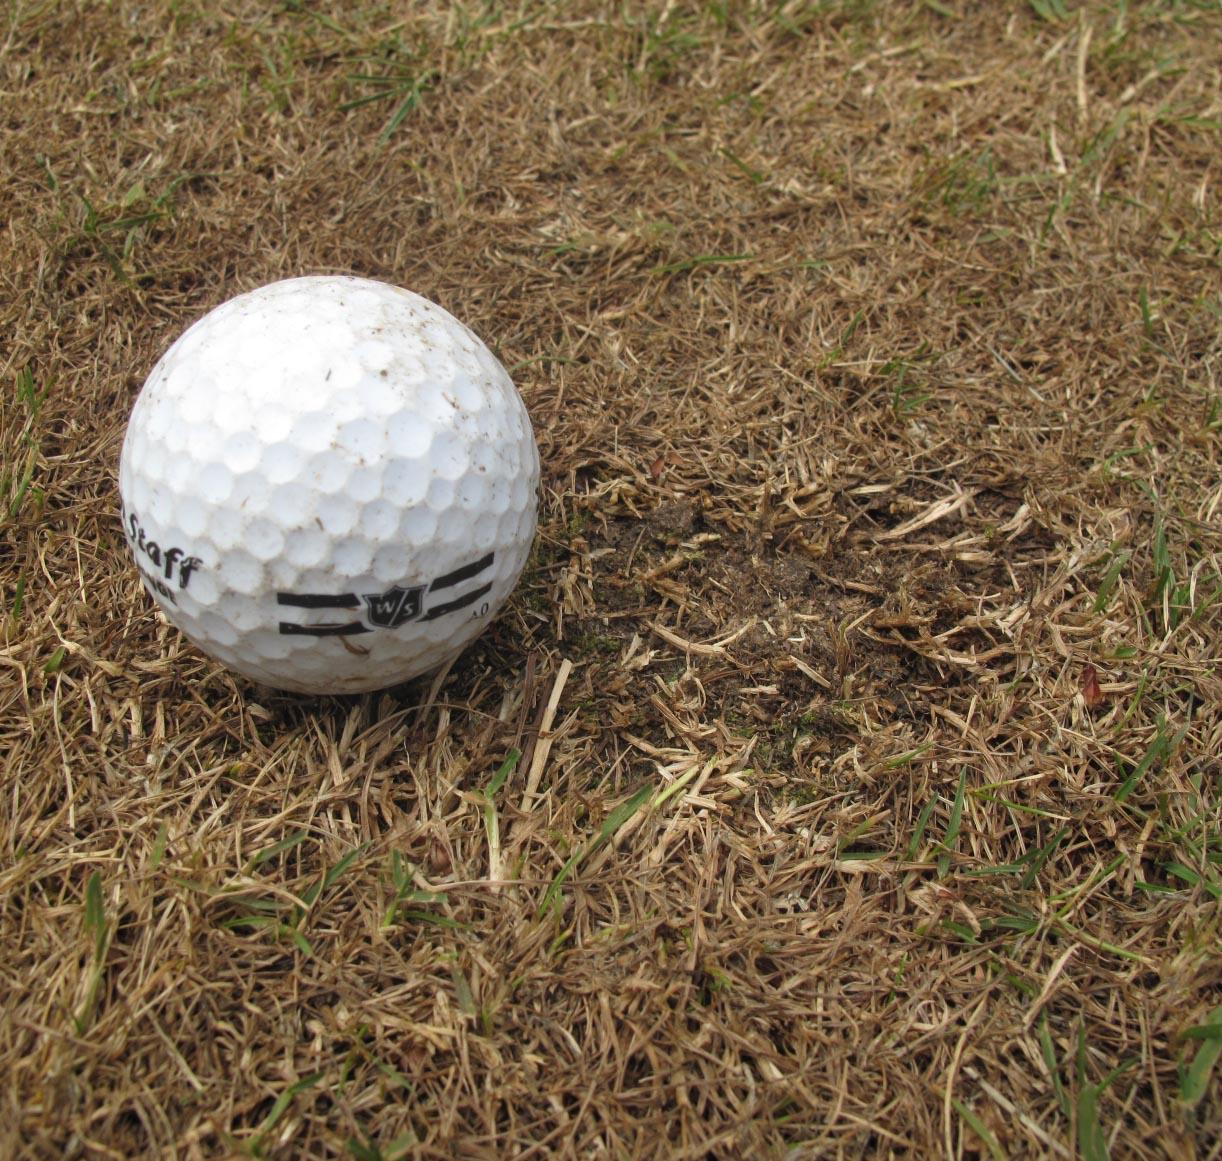 A small divot should follow the ball